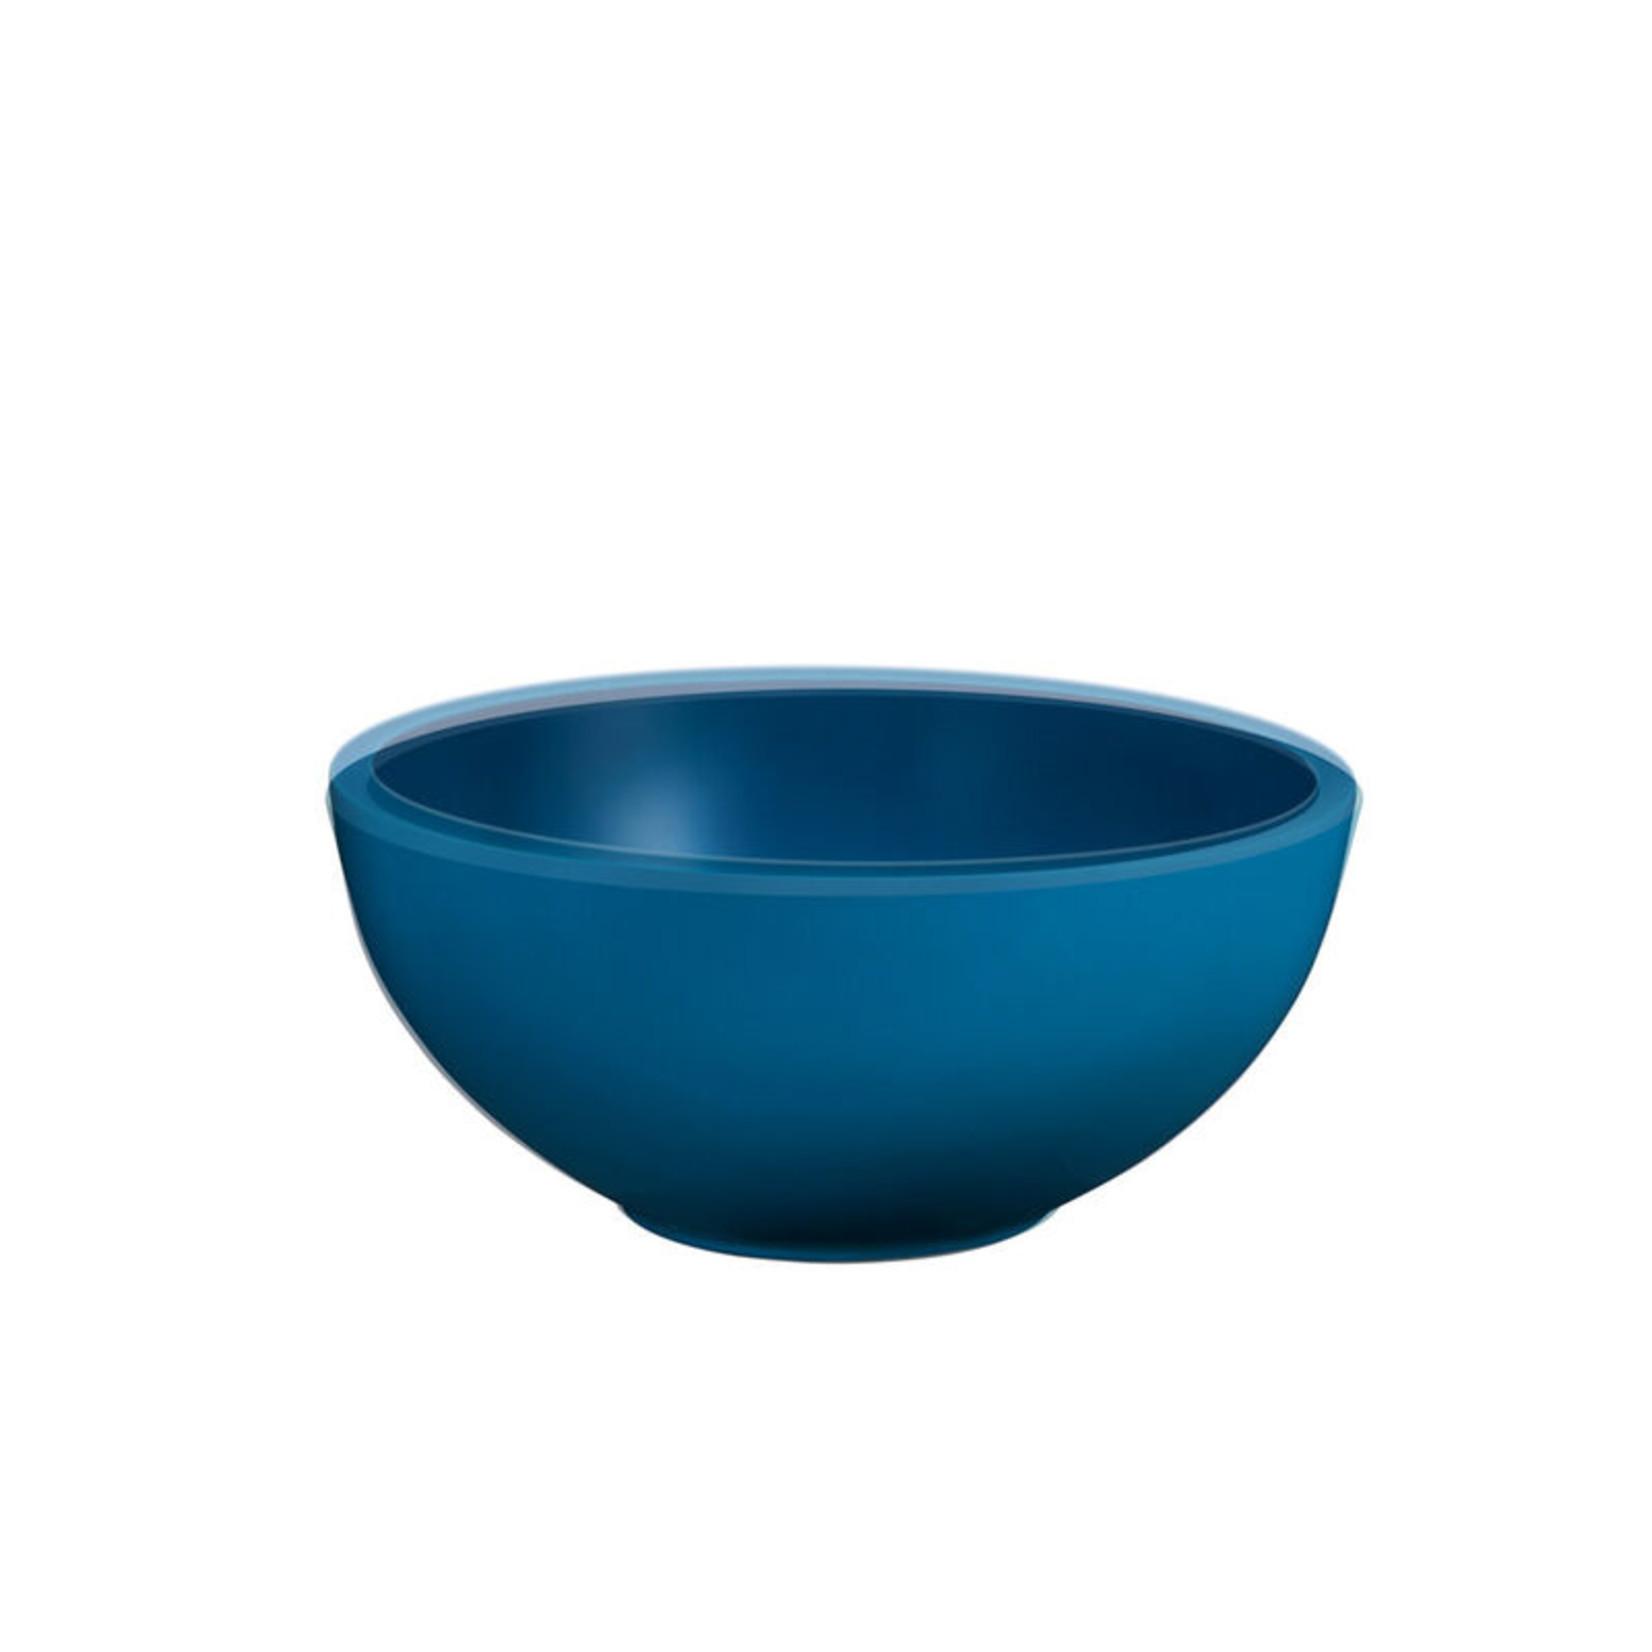 Le Creuset Minimalist Cereal Bowl